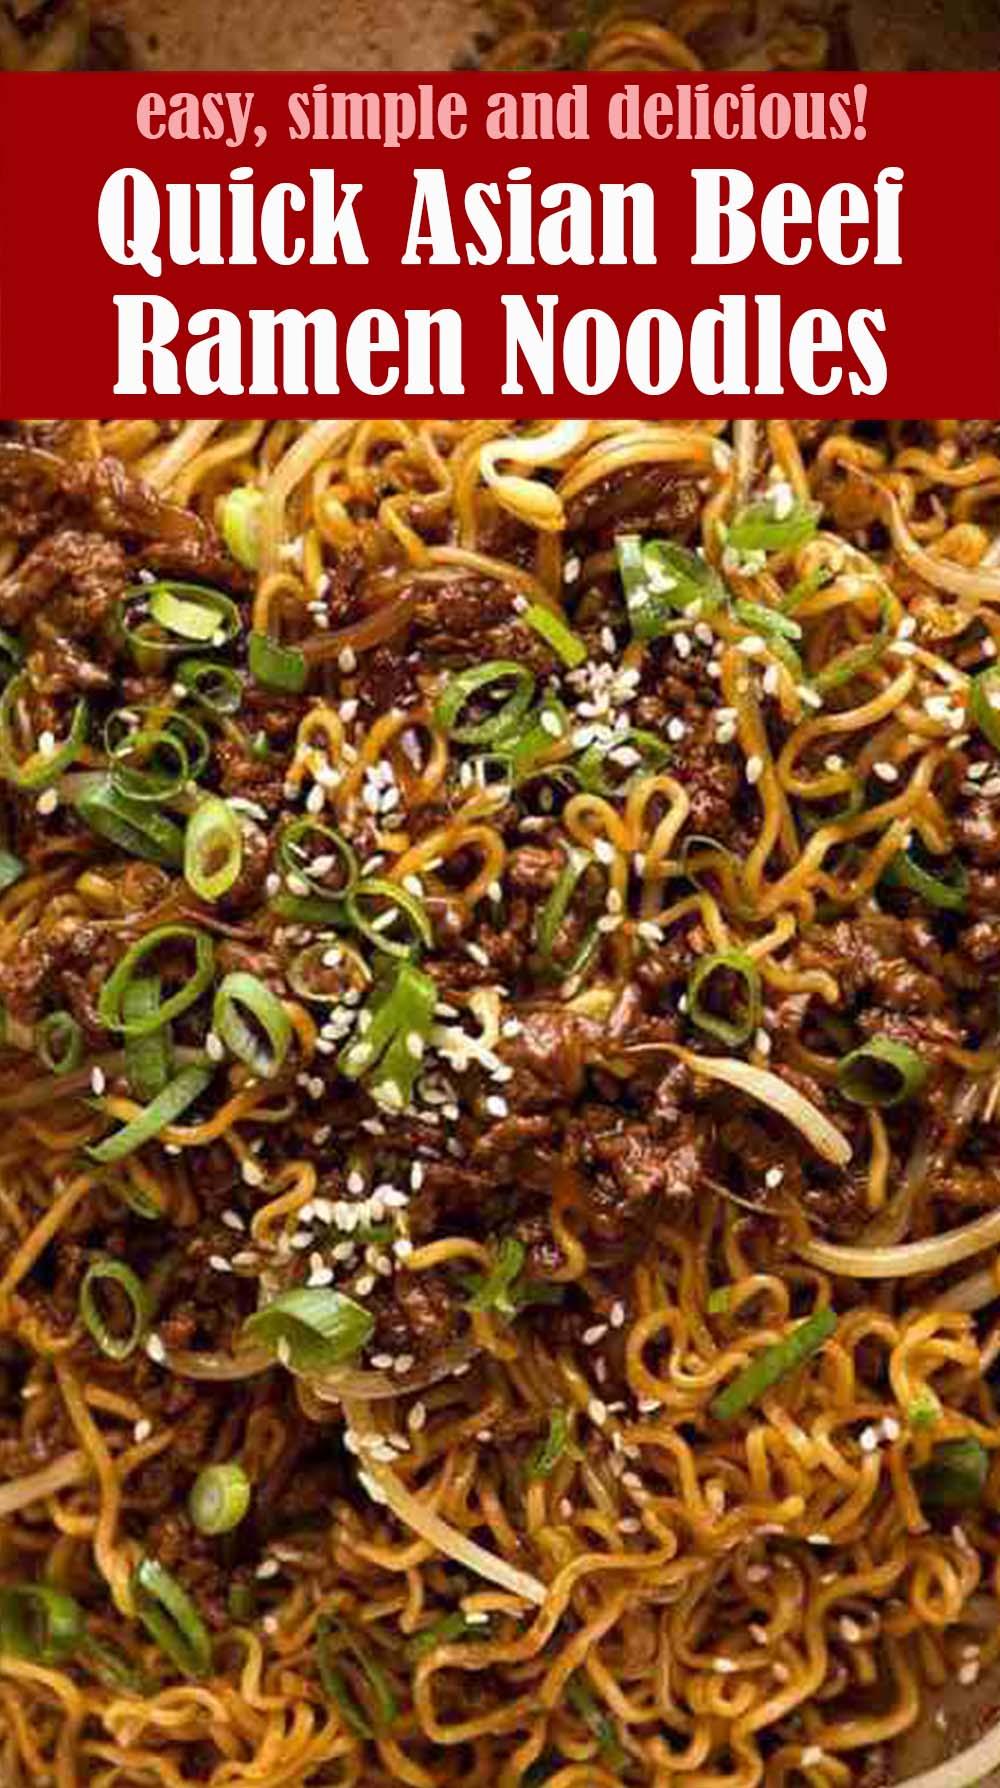 Quick Asian Beef Ramen Noodles Recipe